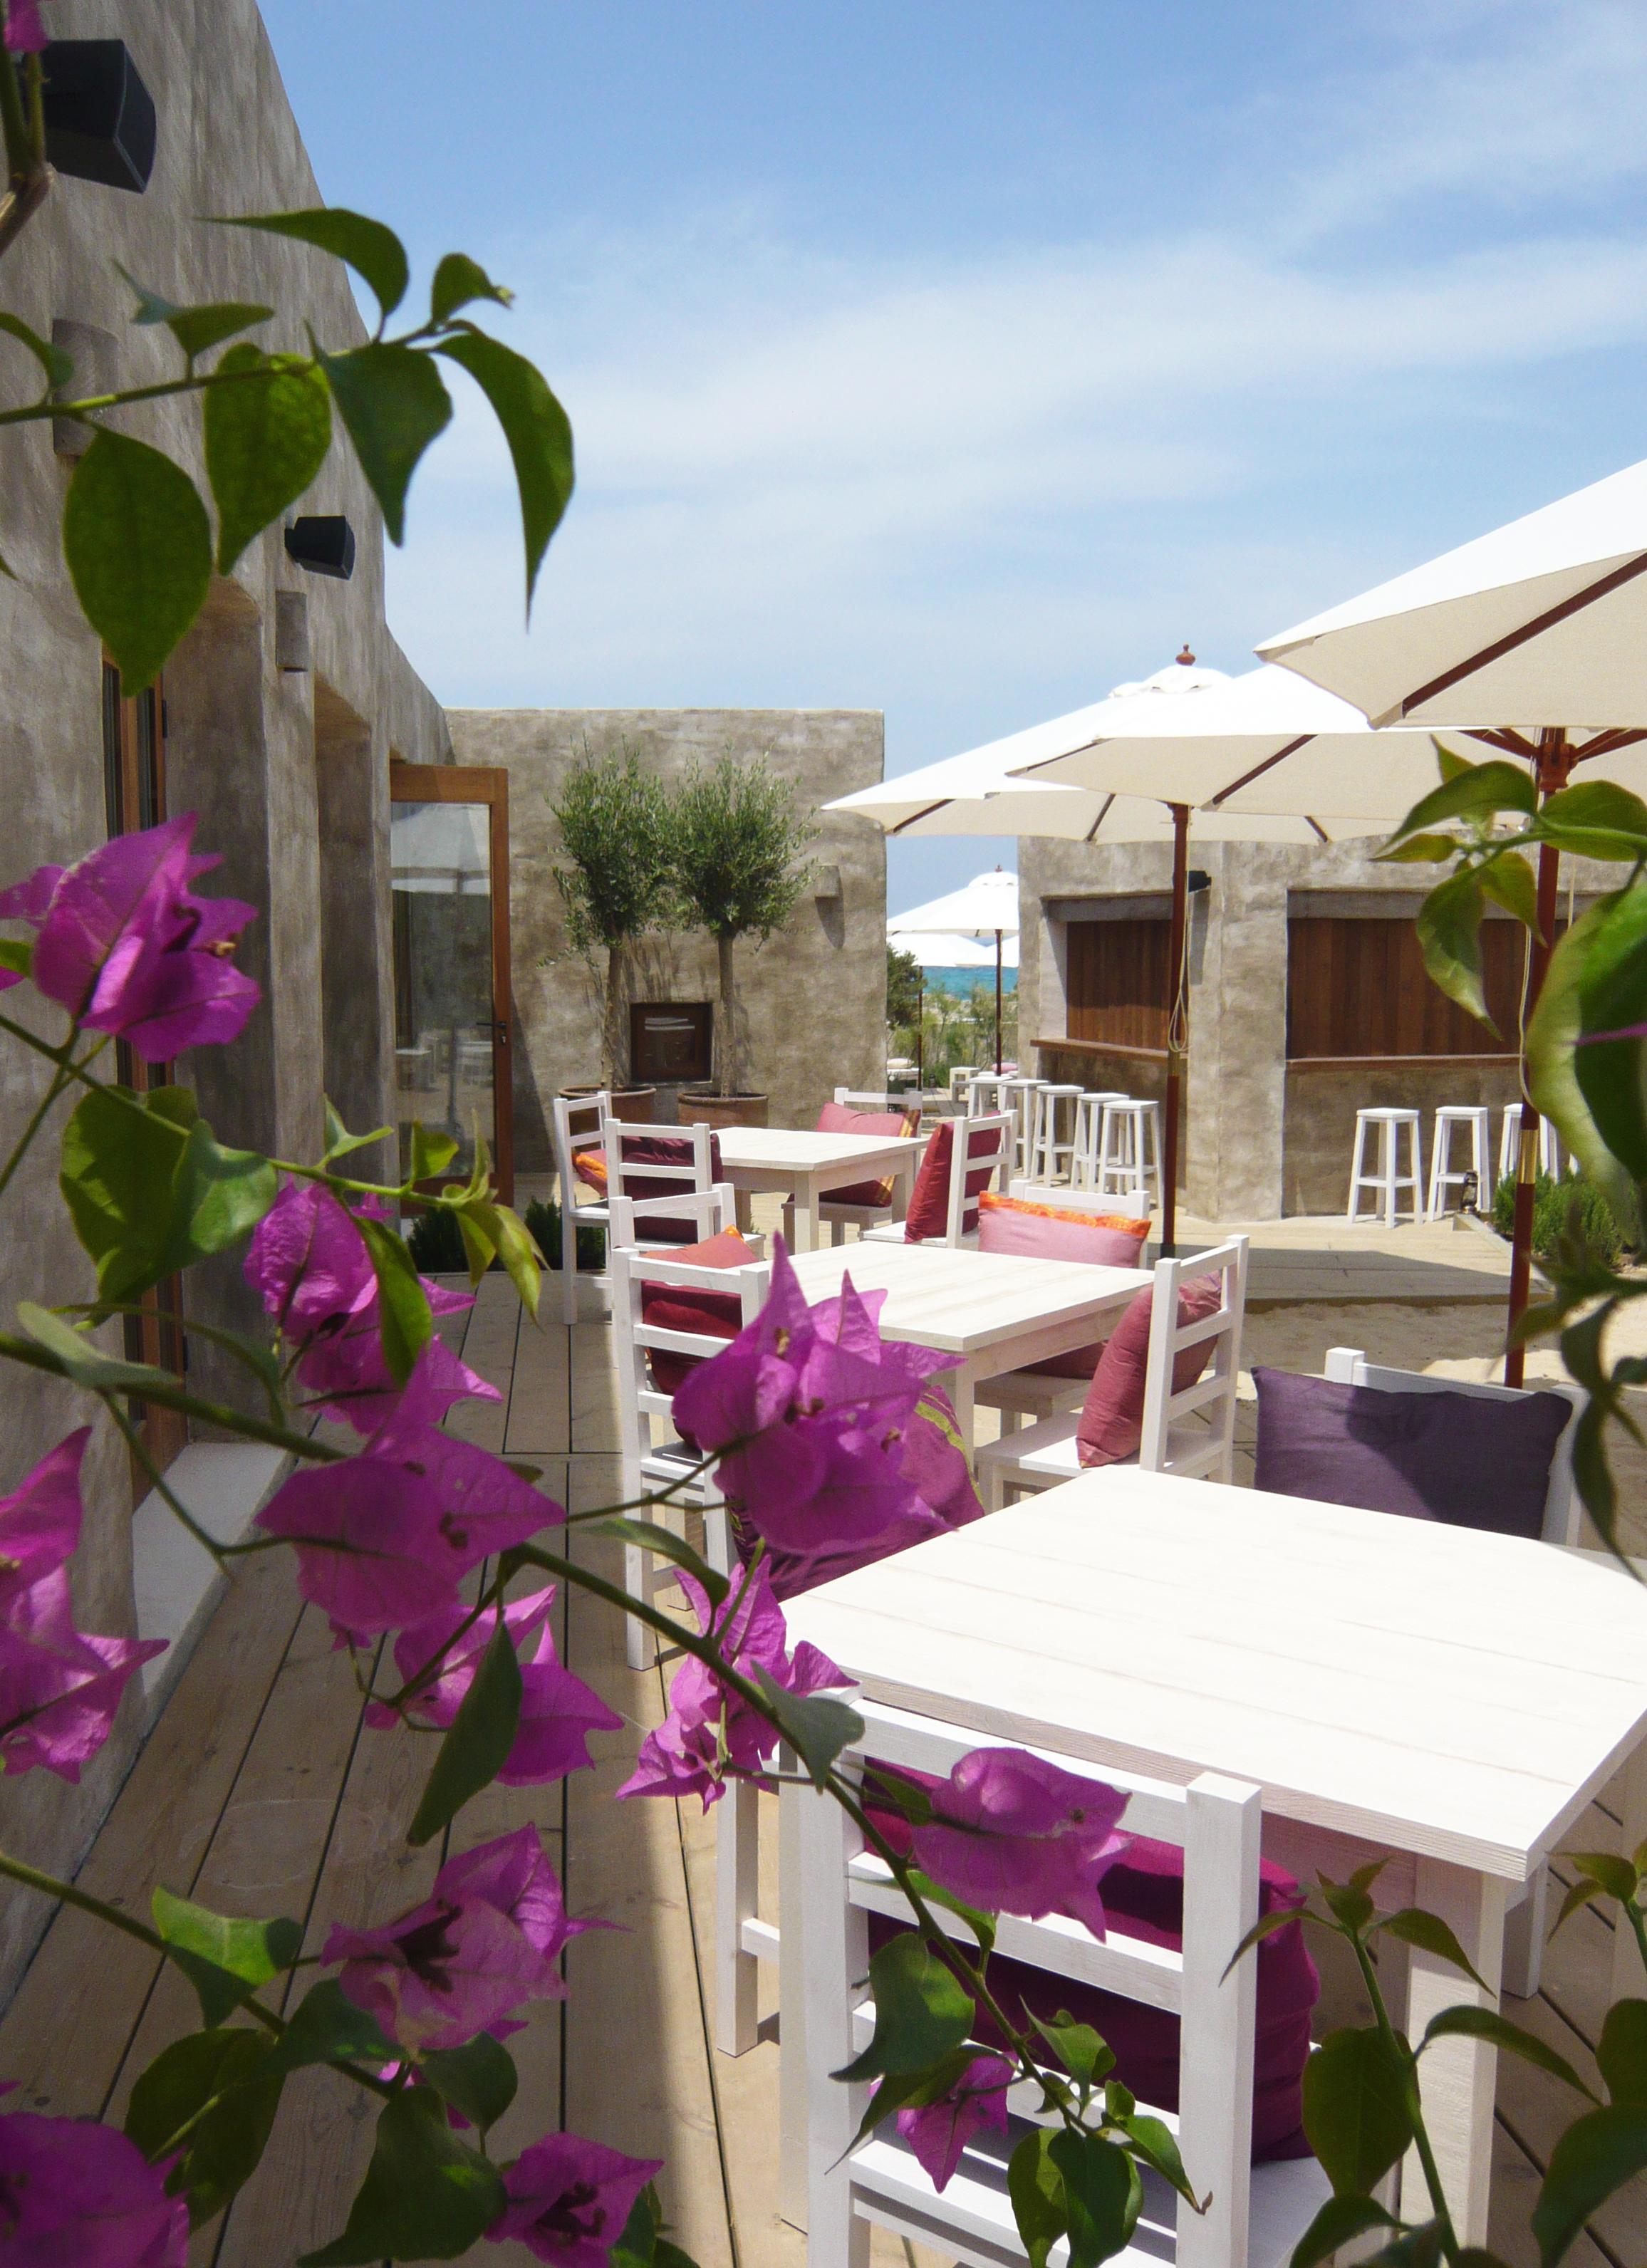 AELAND - restaurant_garden_beach bar.jpg